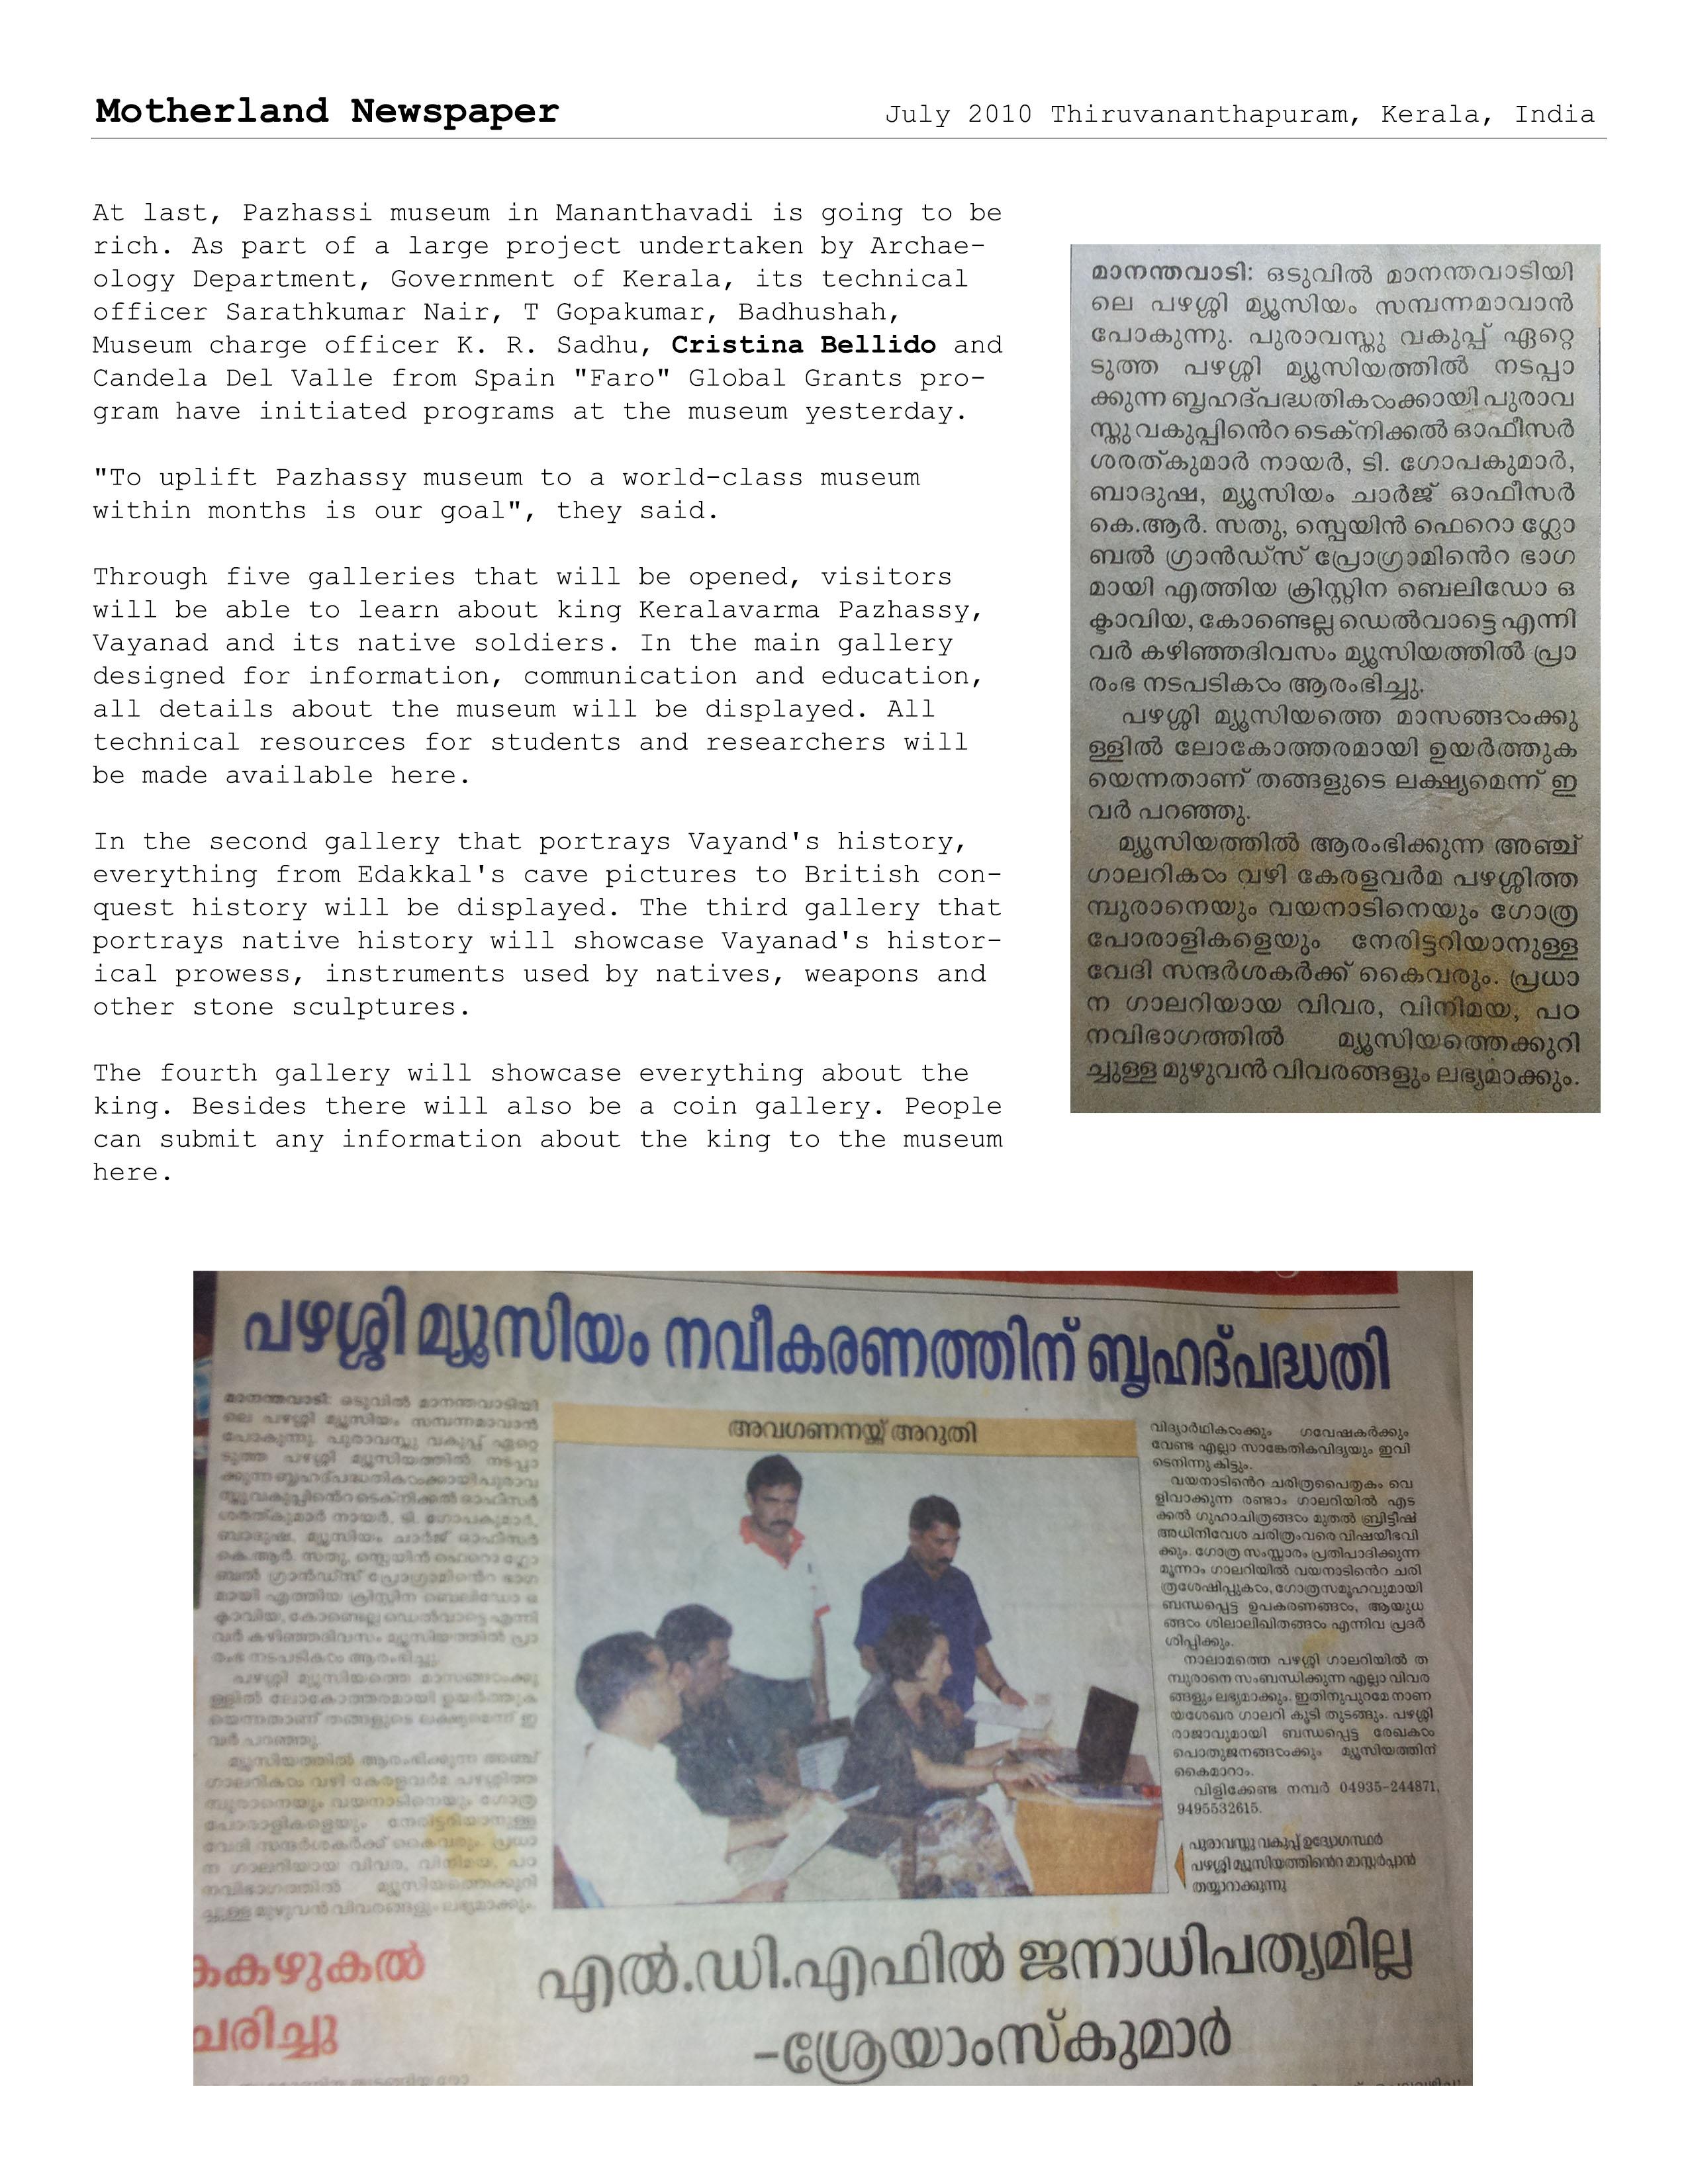 Motherland newspaper